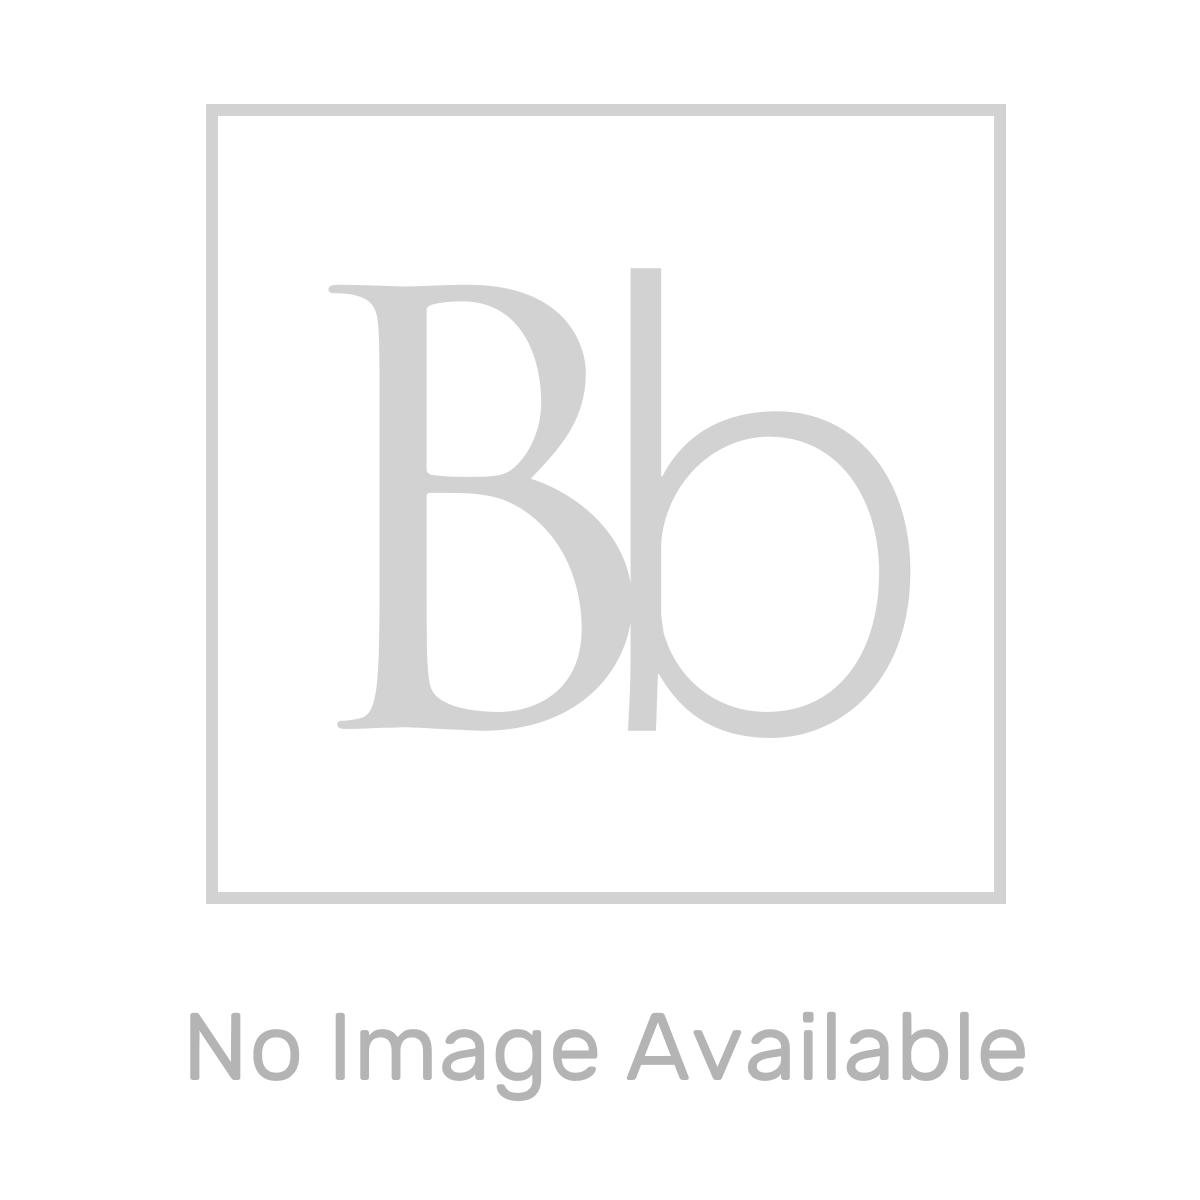 Sena Single Electric Horizontal Radiator 550 x 990mm in Black Detail